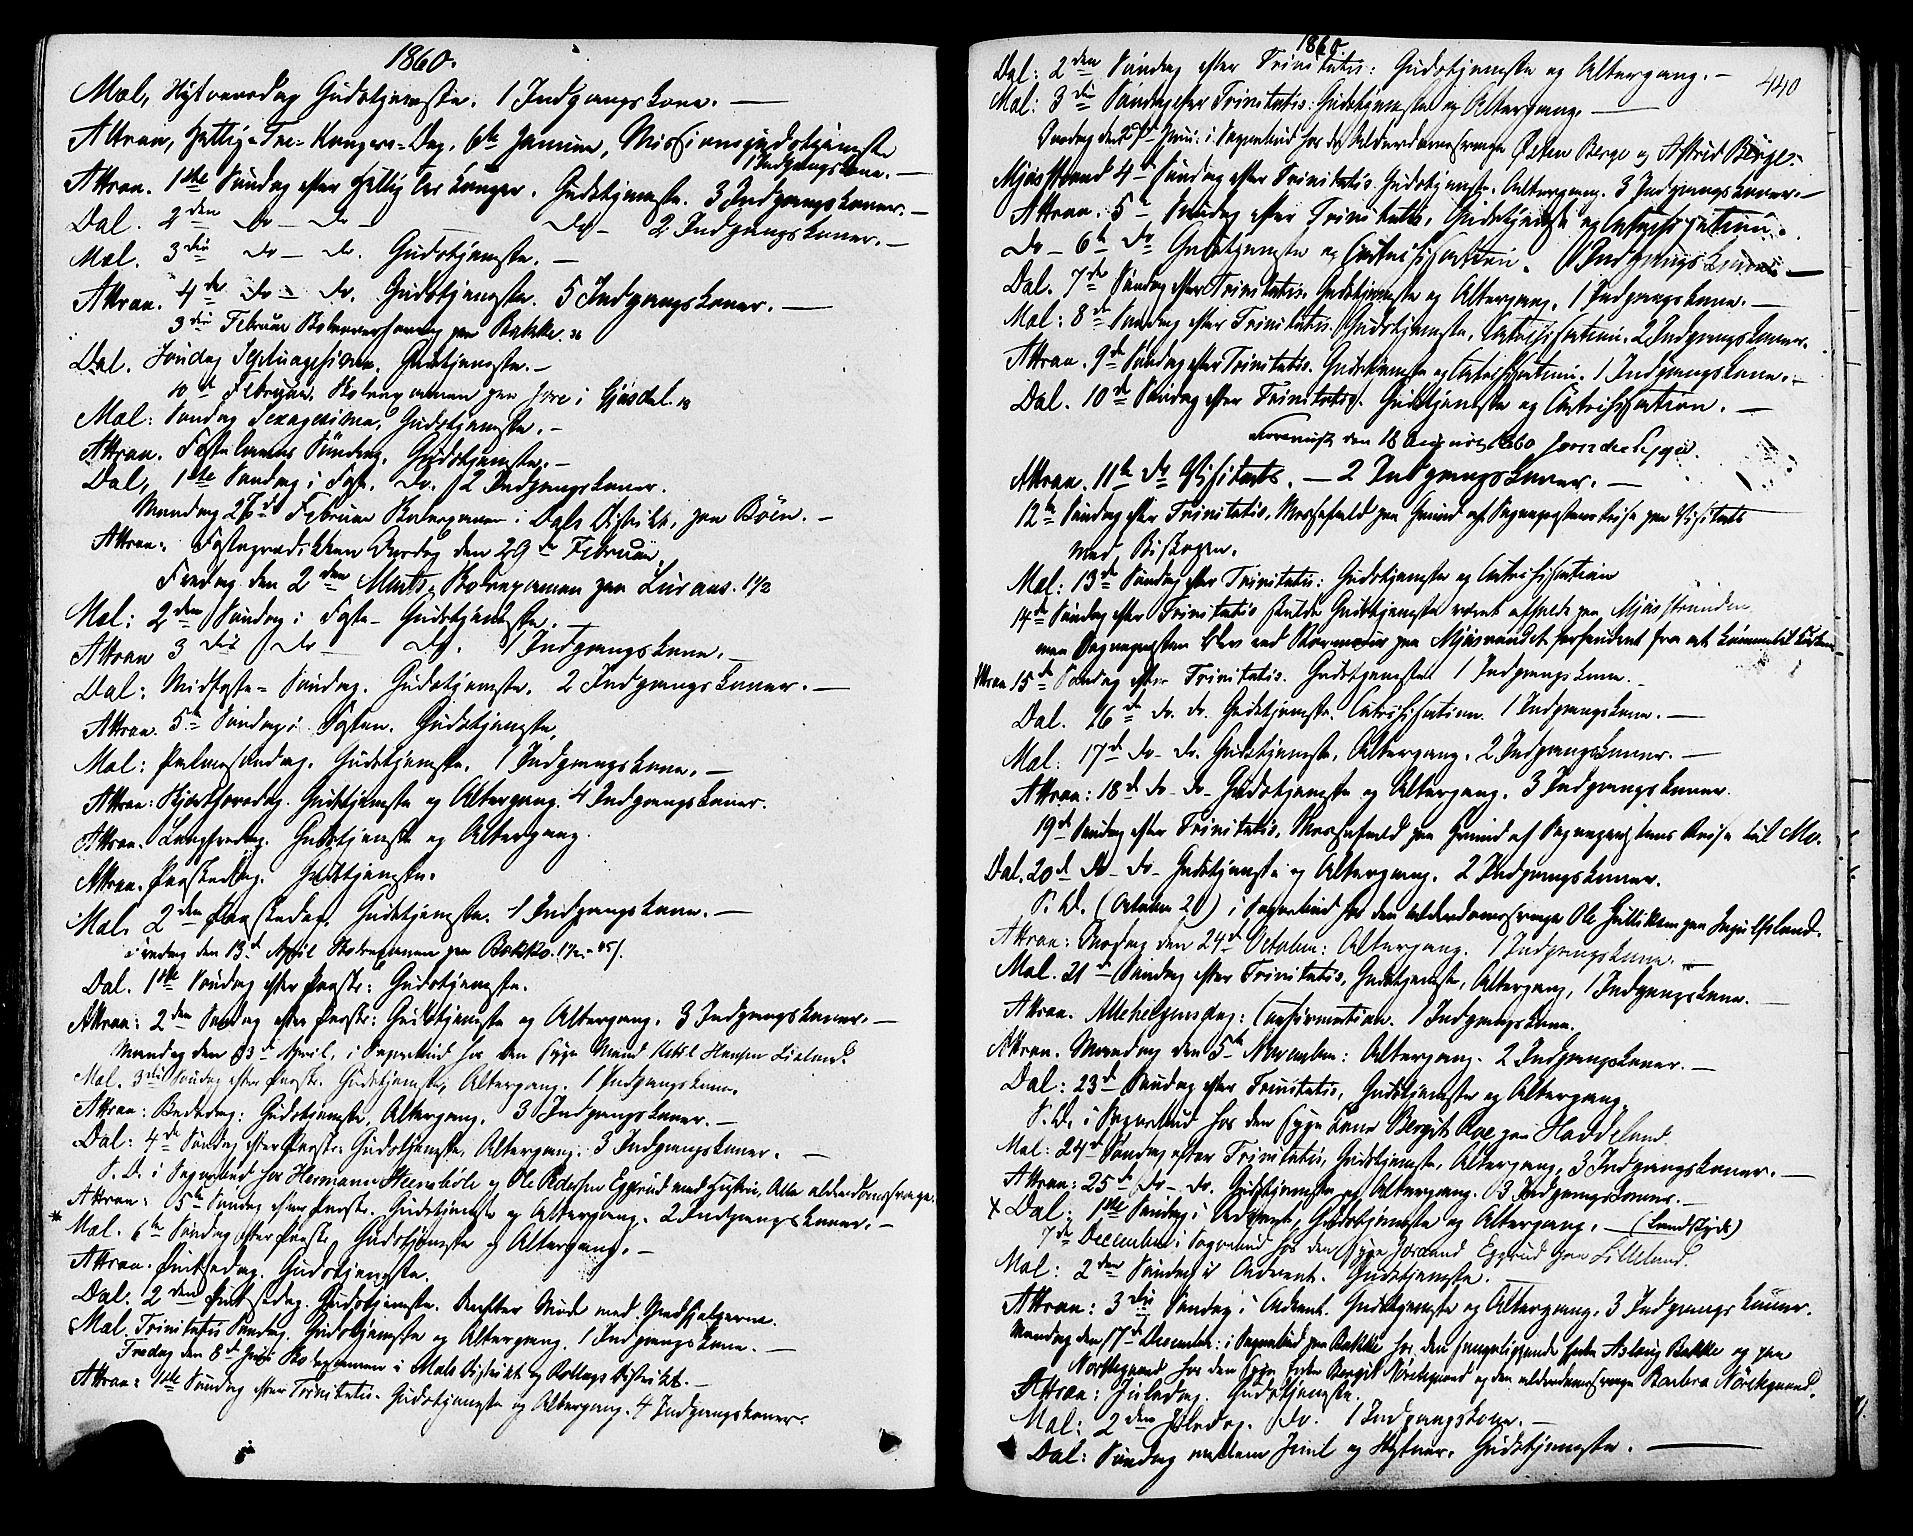 SAKO, Tinn kirkebøker, F/Fa/L0006: Ministerialbok nr. I 6, 1857-1878, s. 440